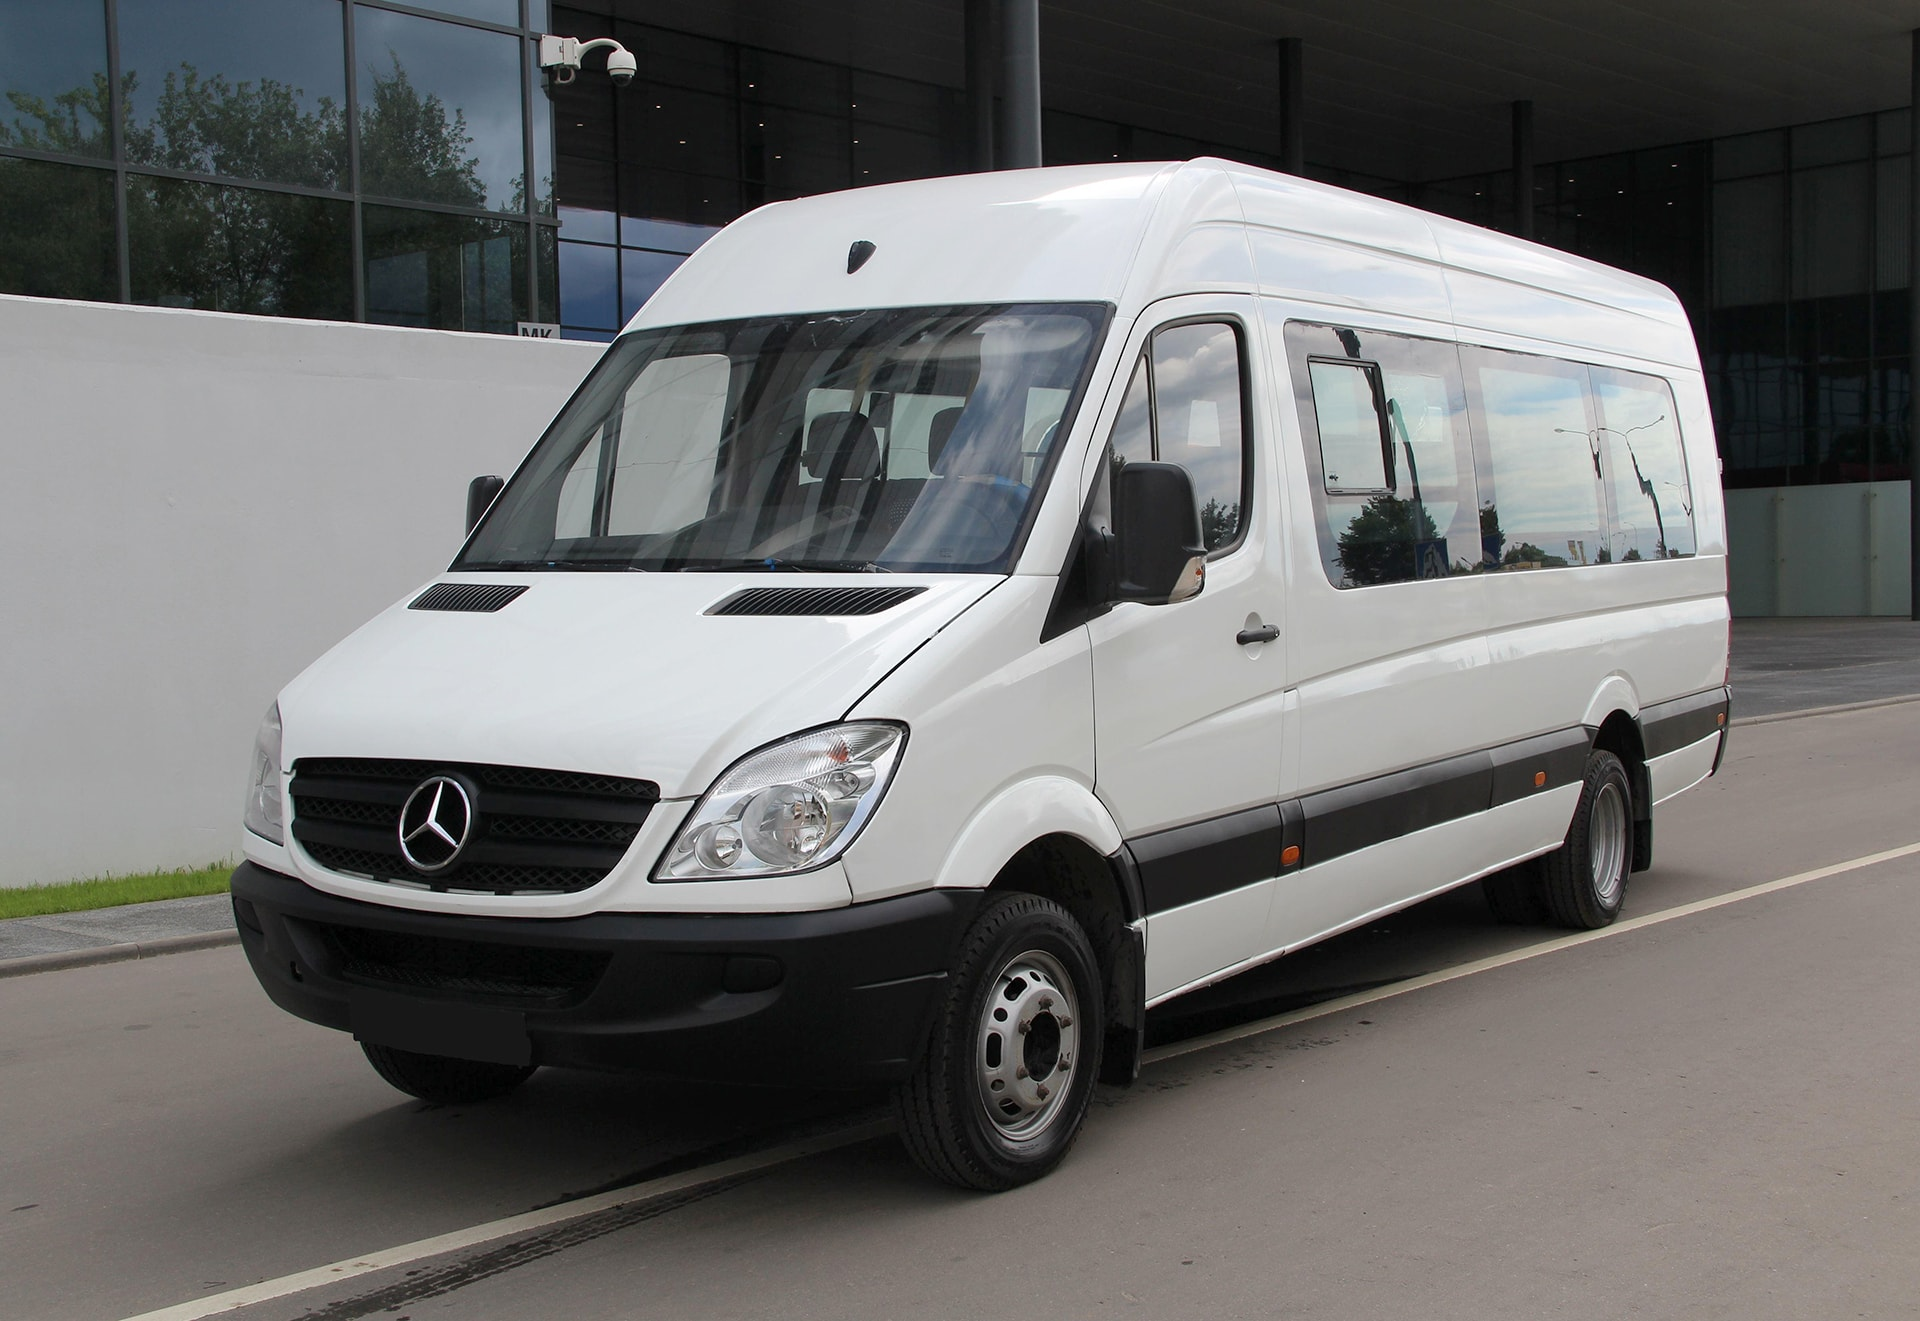 coinss passenger worker for wheel steering benz van mercedes sprinter coin less news offers rental capability